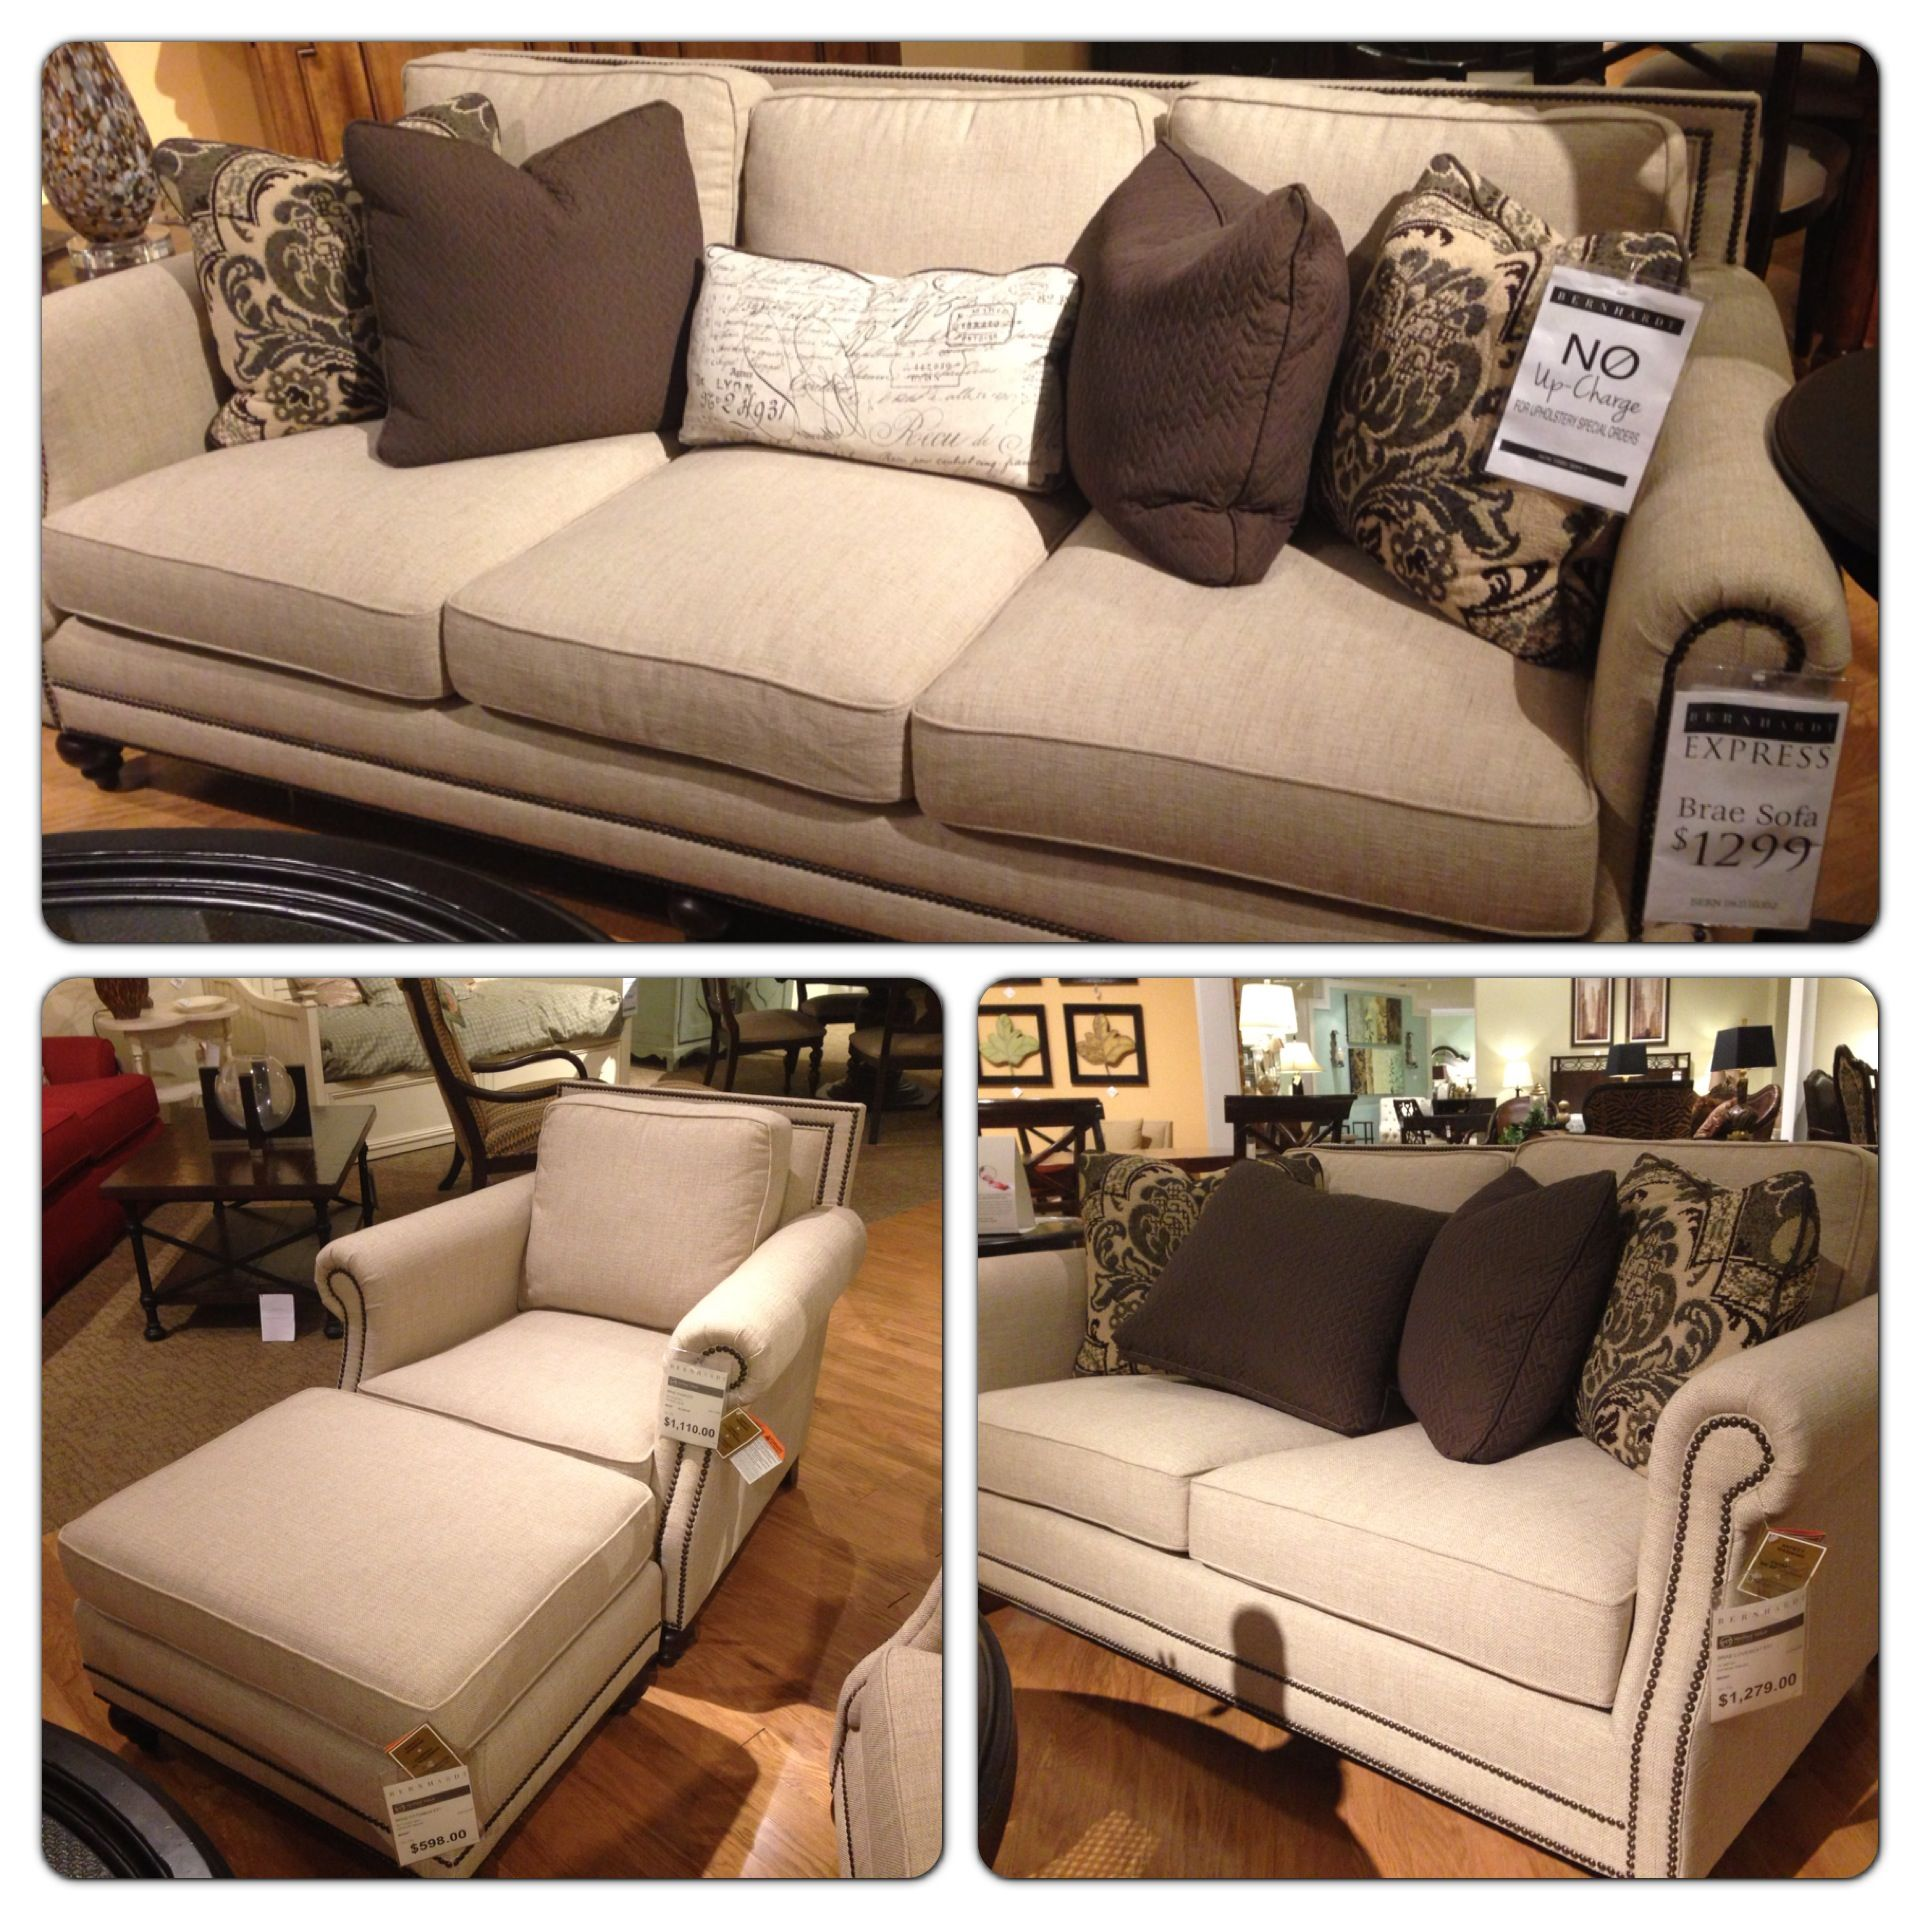 My Chair Bernhardt Brae Couch 1299 Love Seat 1279 Chair